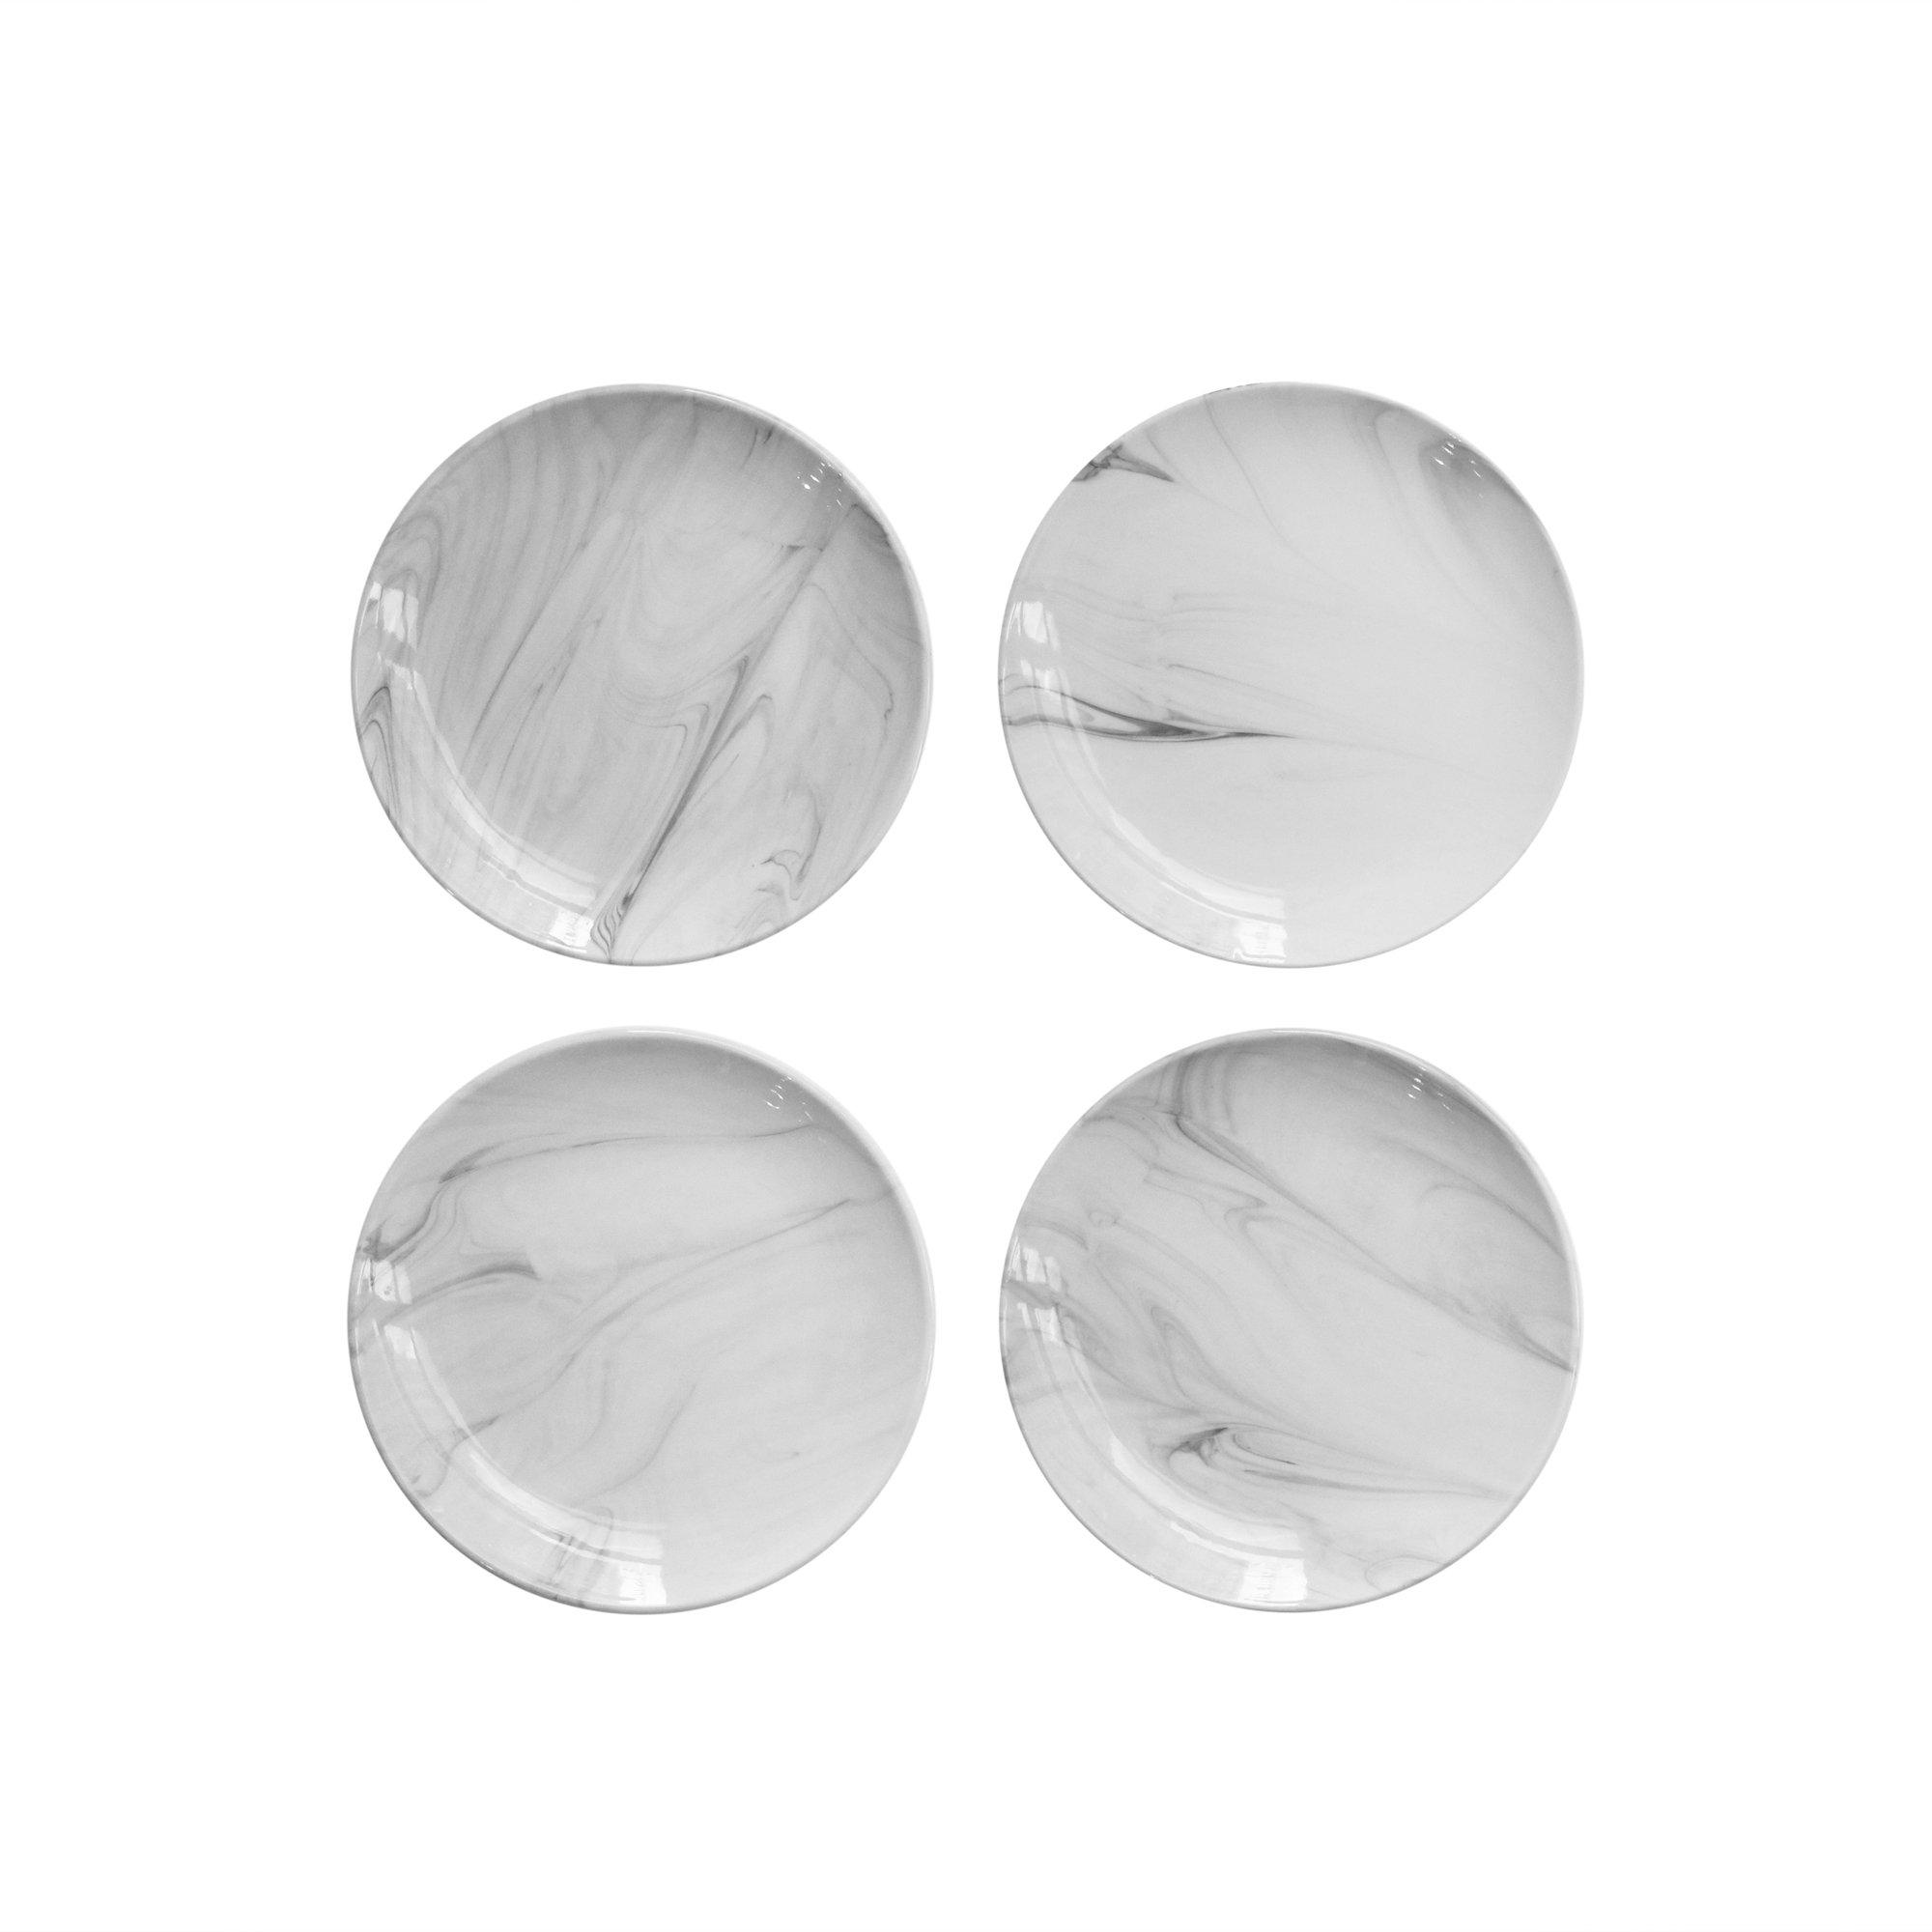 Jay Imports Marble Gray New Bone China Set of 4 Canape Dessert Plates by Jay Imports (Image #1)